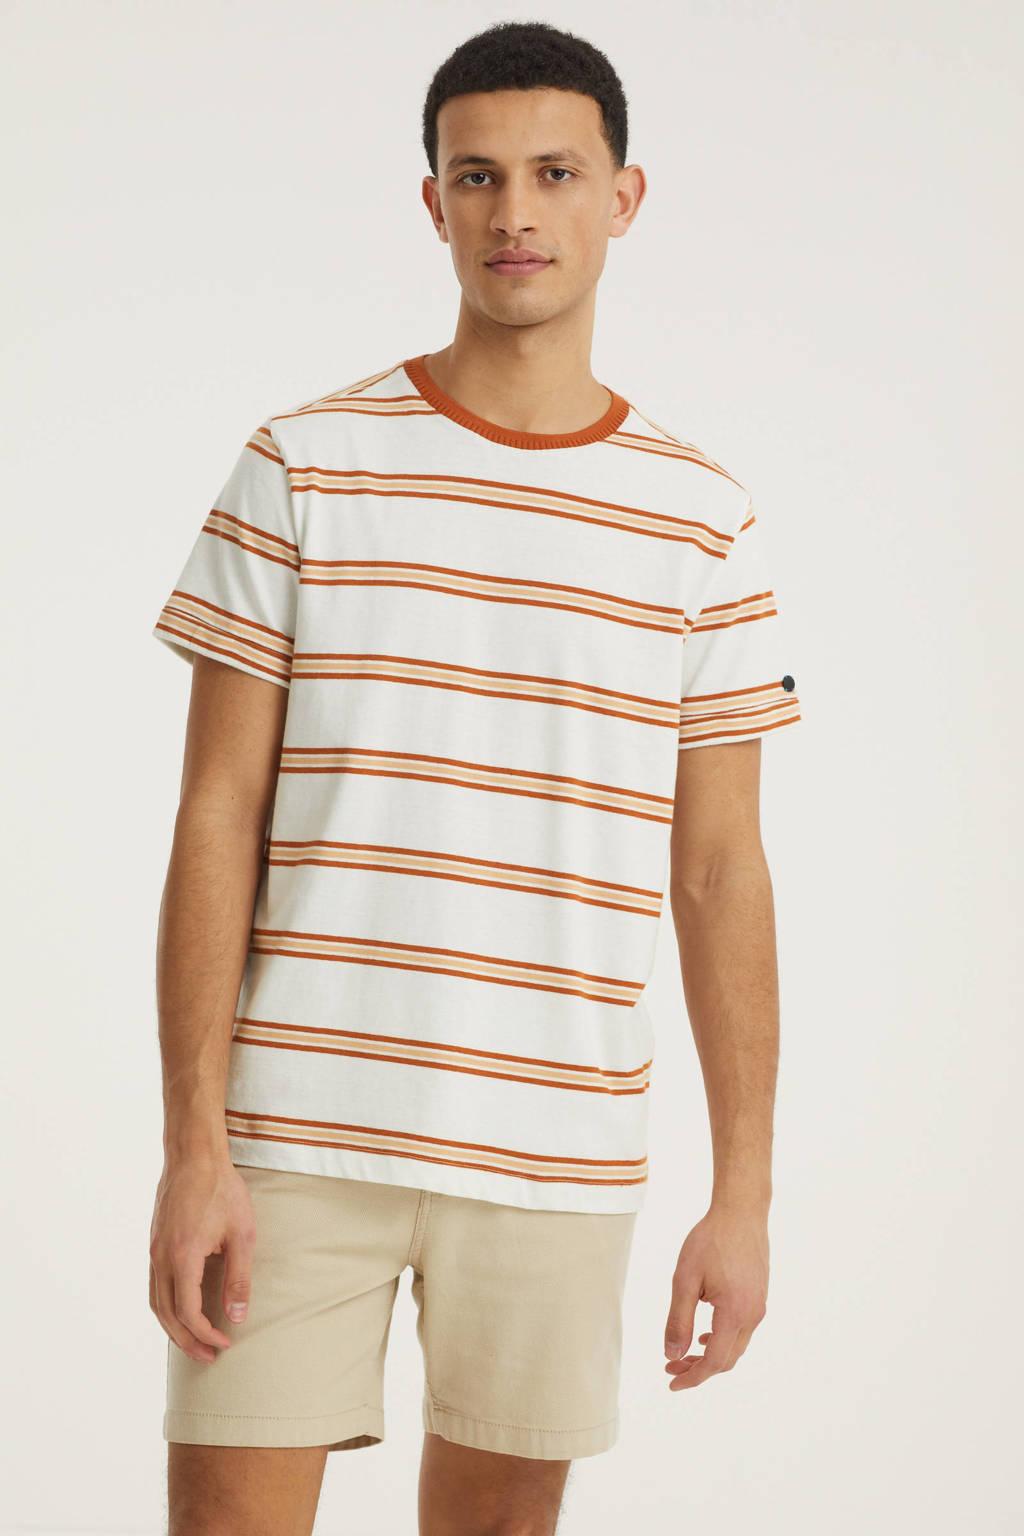 Cast Iron gestreept T-shirt ecru/oranje, Ecru/oranje